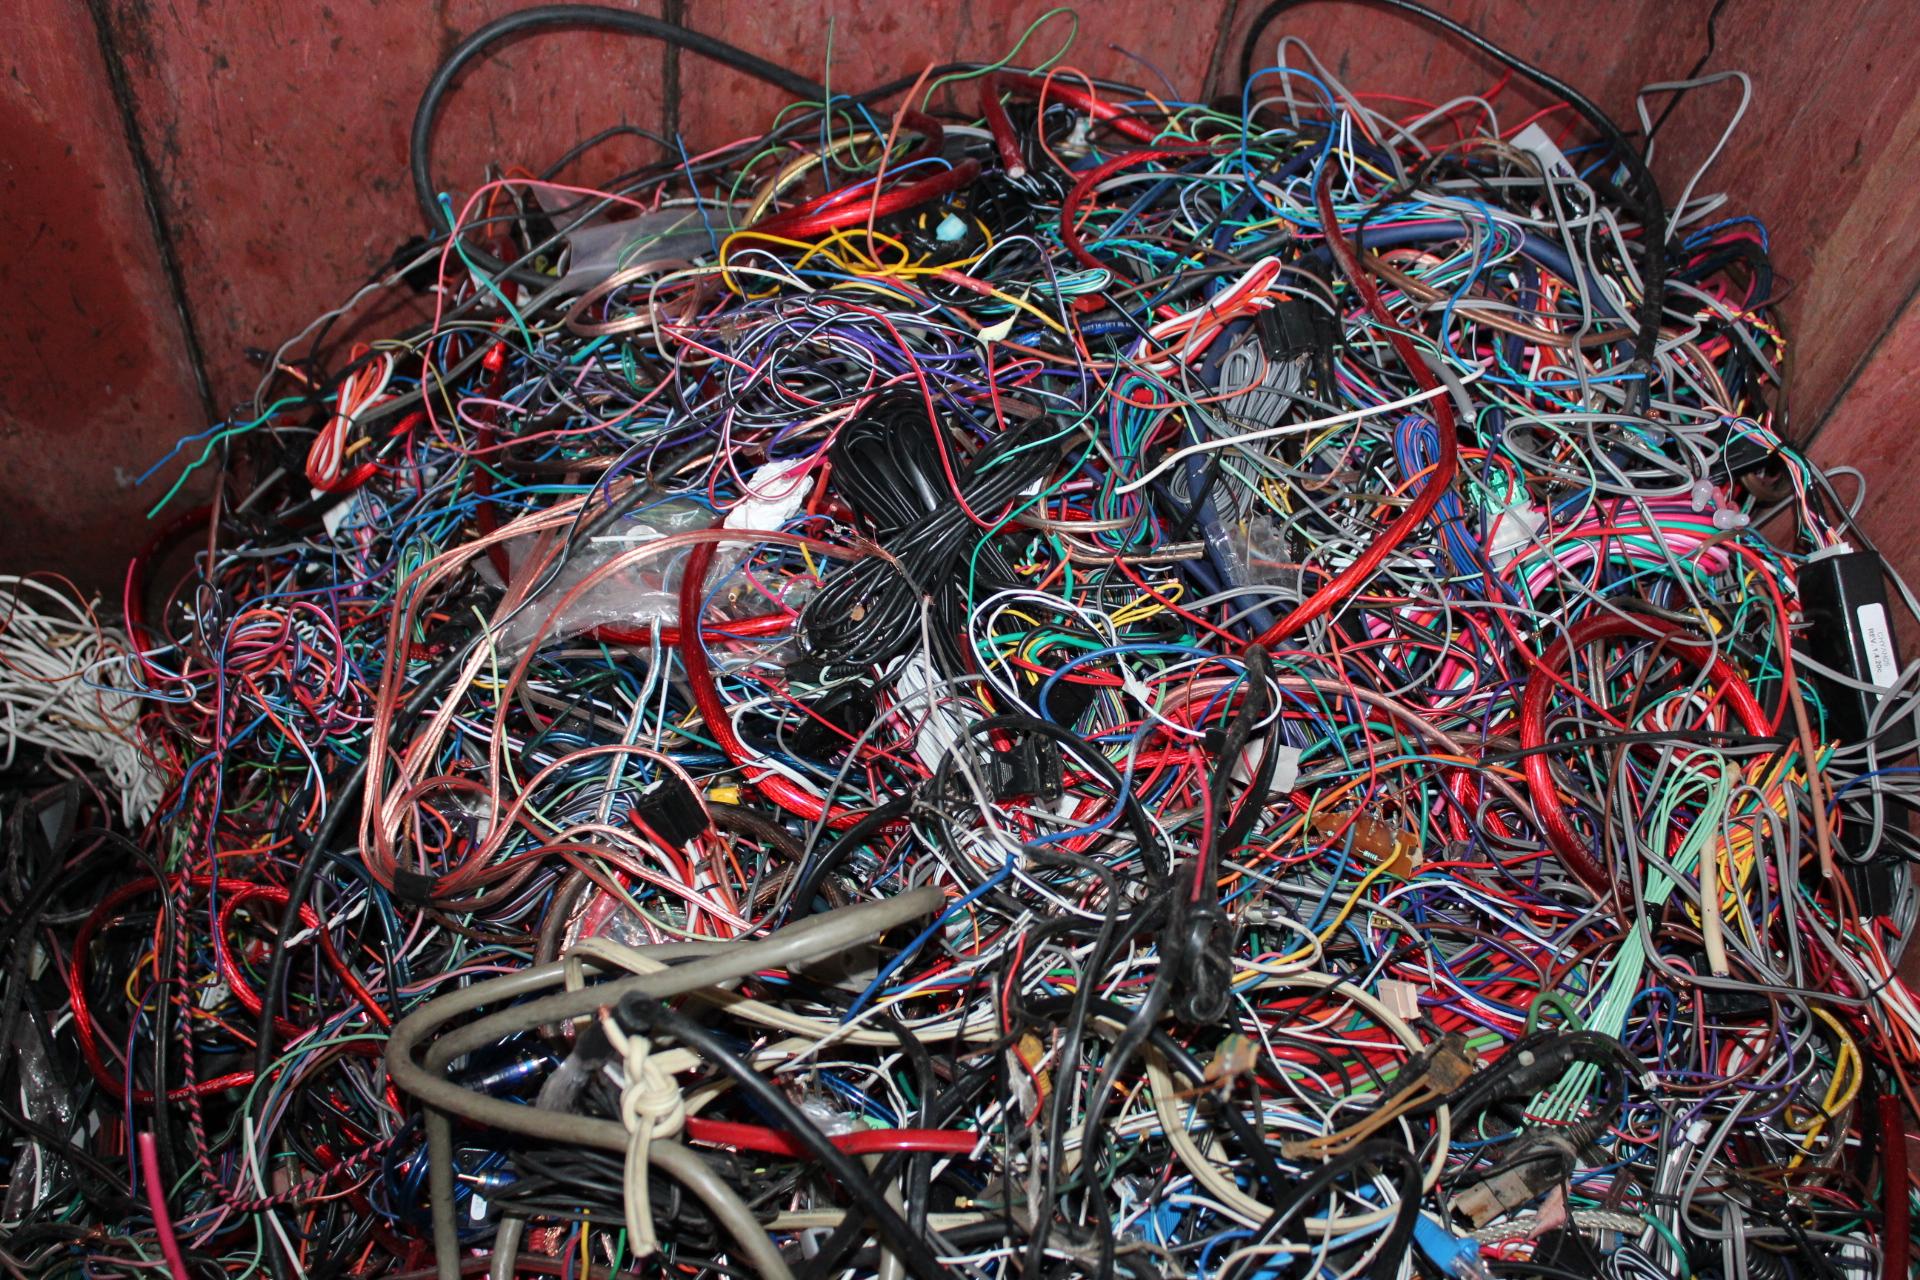 Copper Recycling | Copper Recycling Center Sacramento CA on